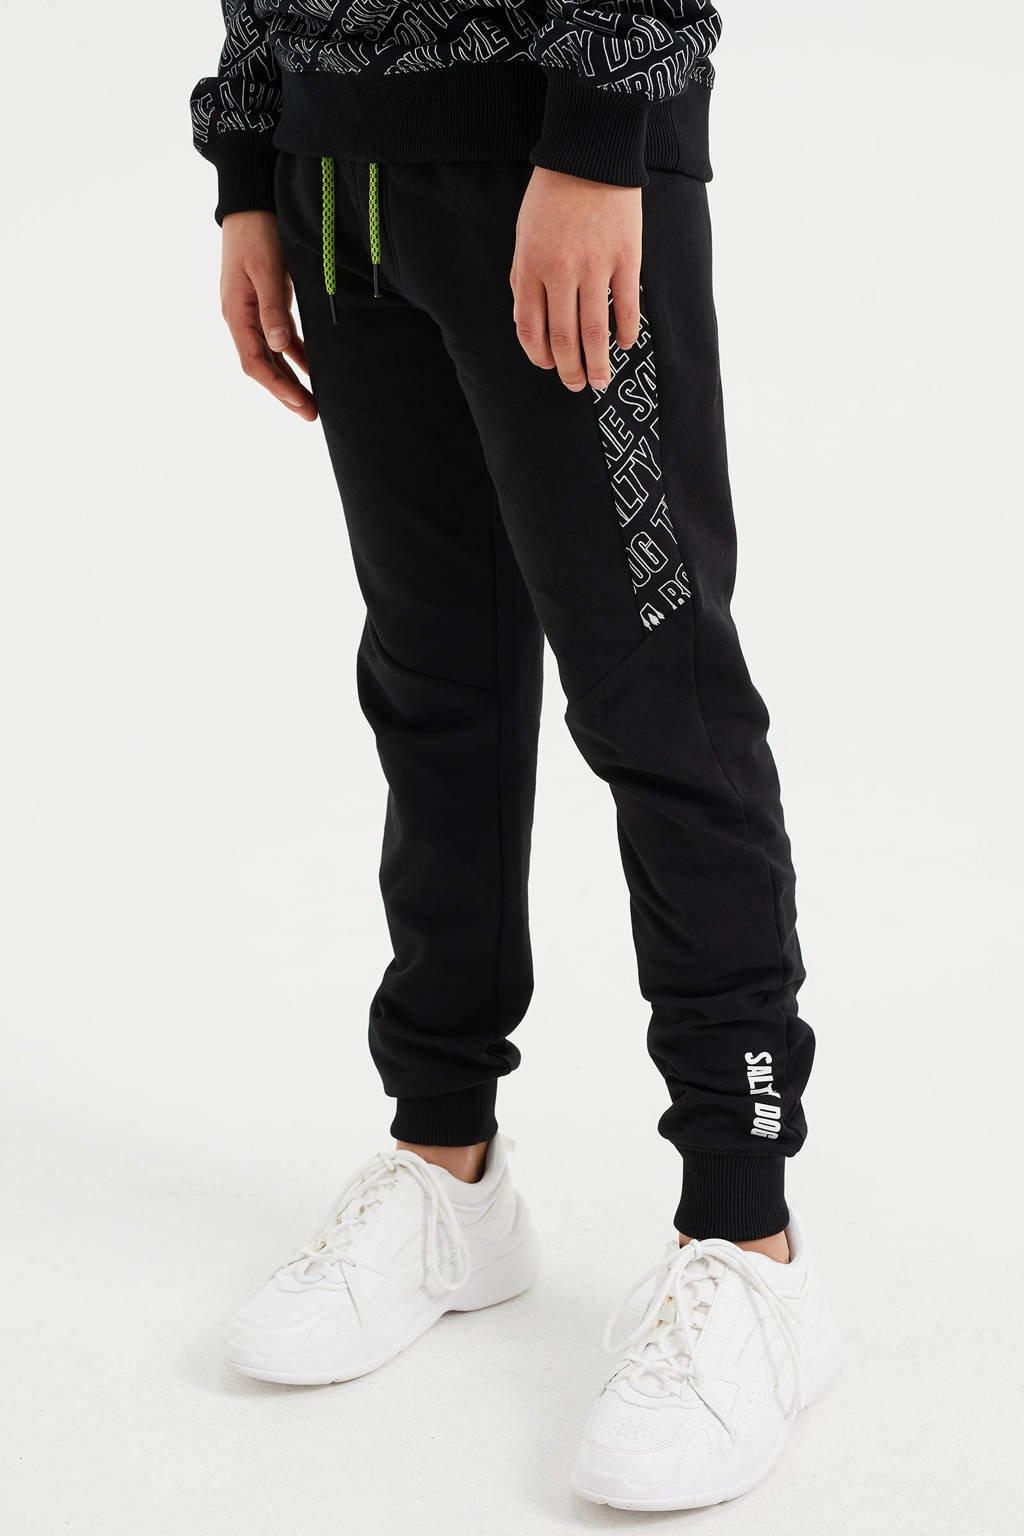 WE Fashion Salty Dog slim fit joggingbroek met tekst zwart, Zwart